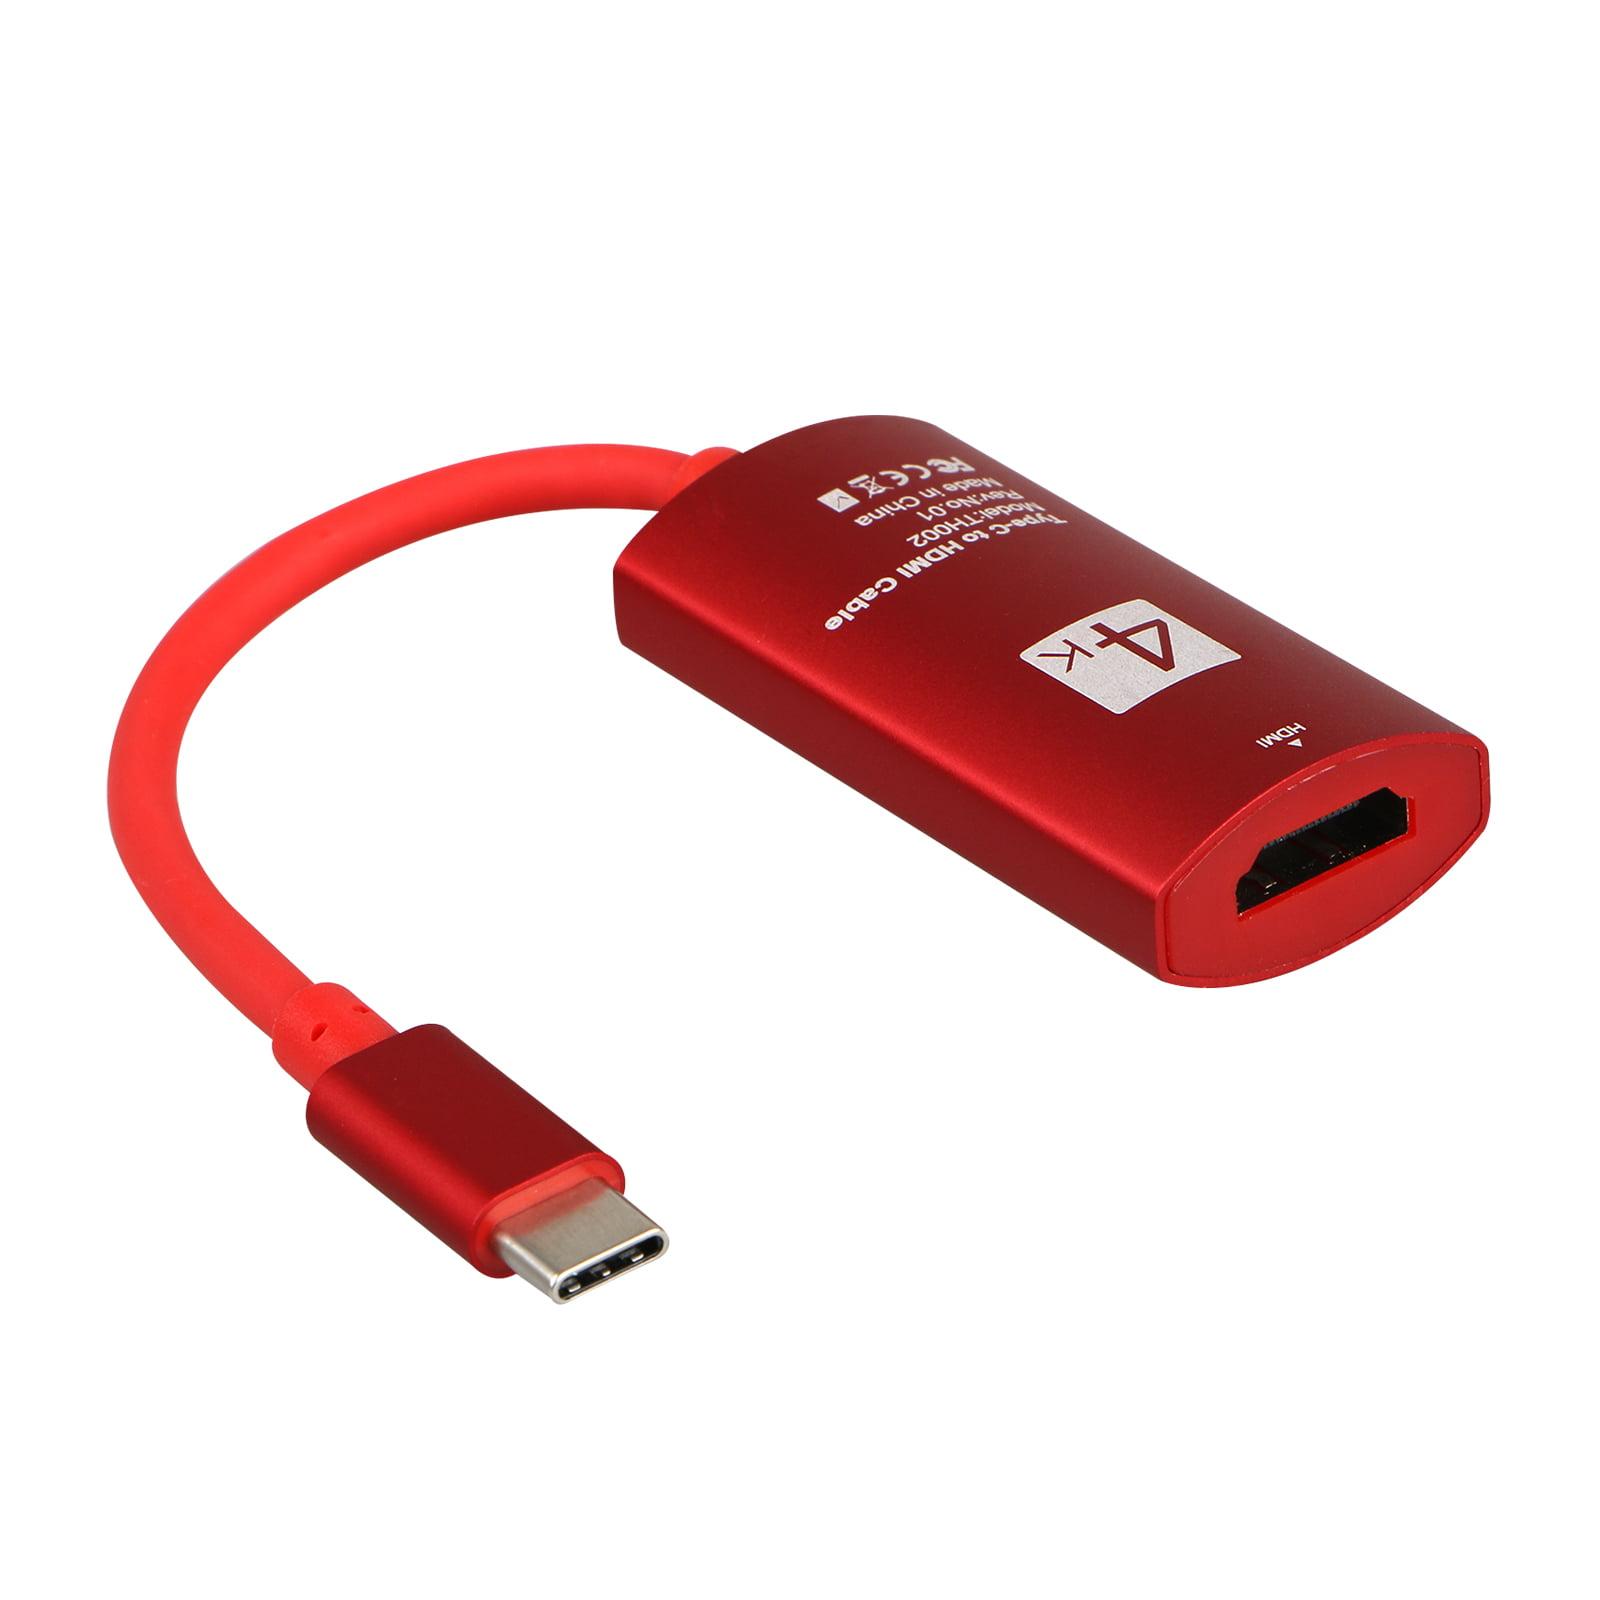 TSV USB-C Type-C to HDMI 4K*2K UHD HDTV Adapter for Samsung Galaxy S9/S8 MacBook Pro